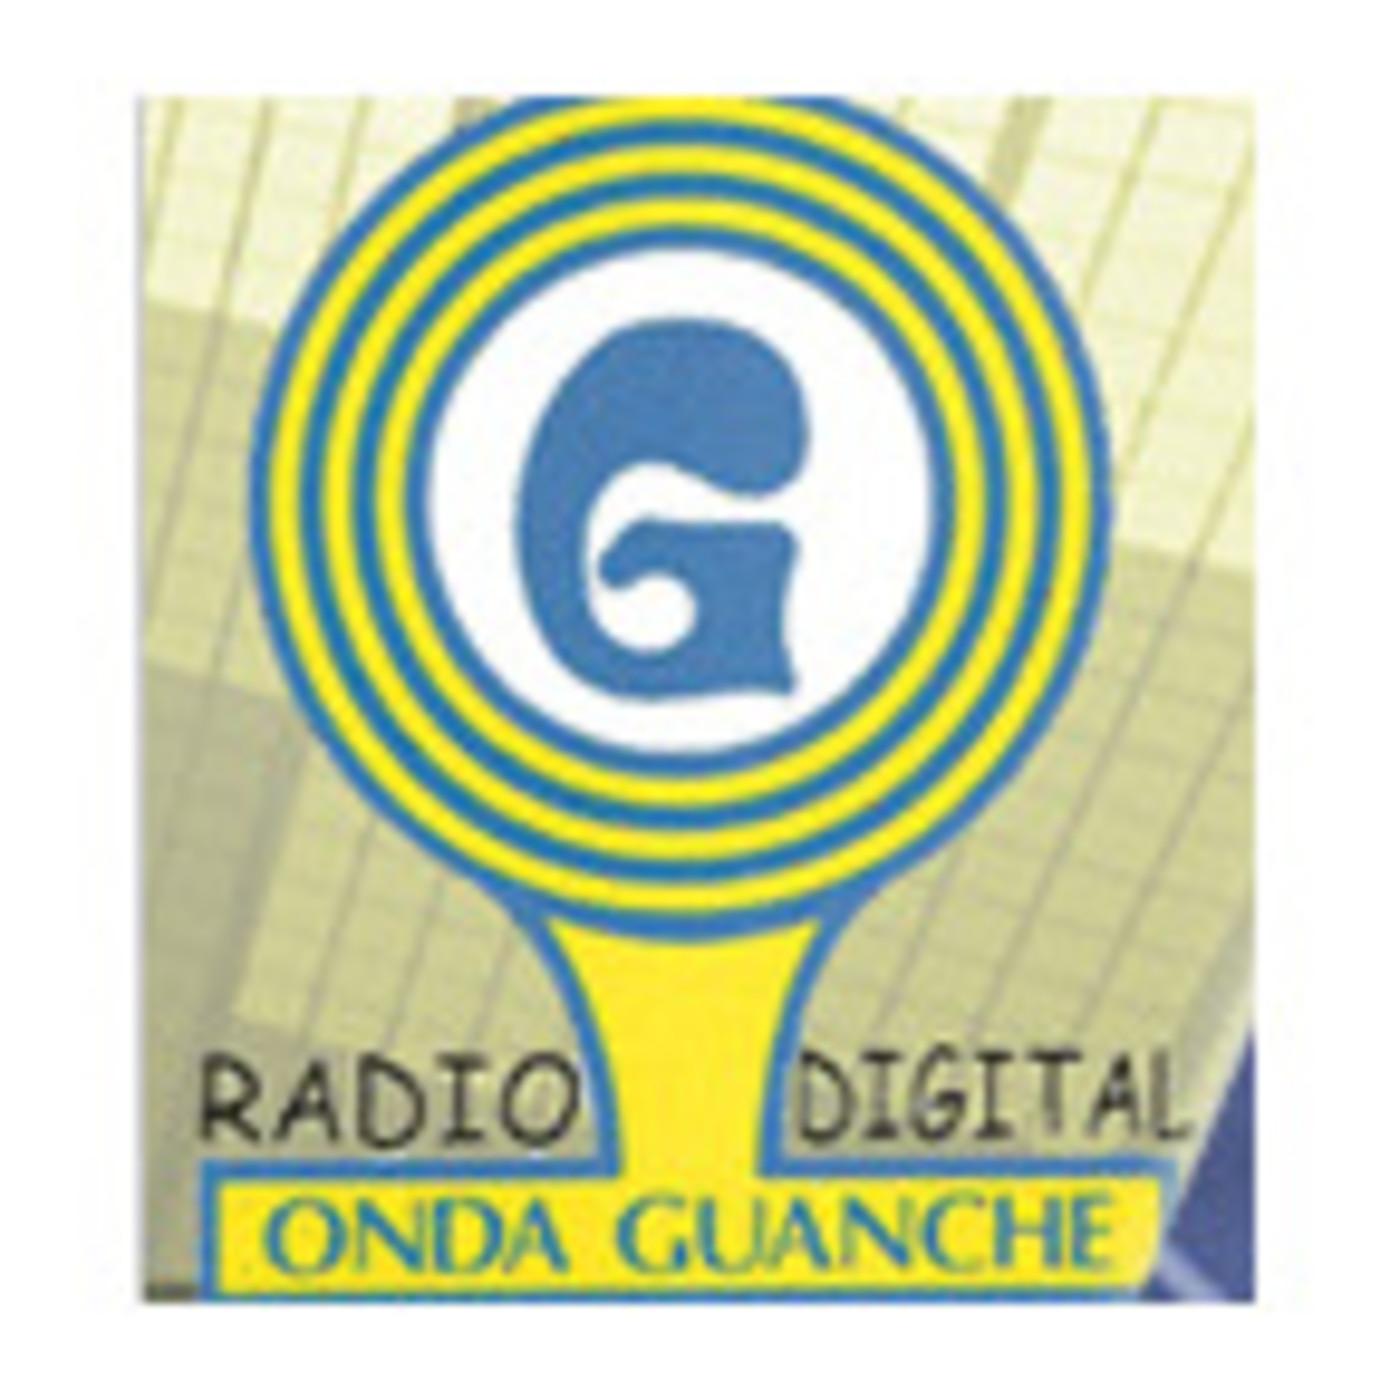 Onda Guanche Radio